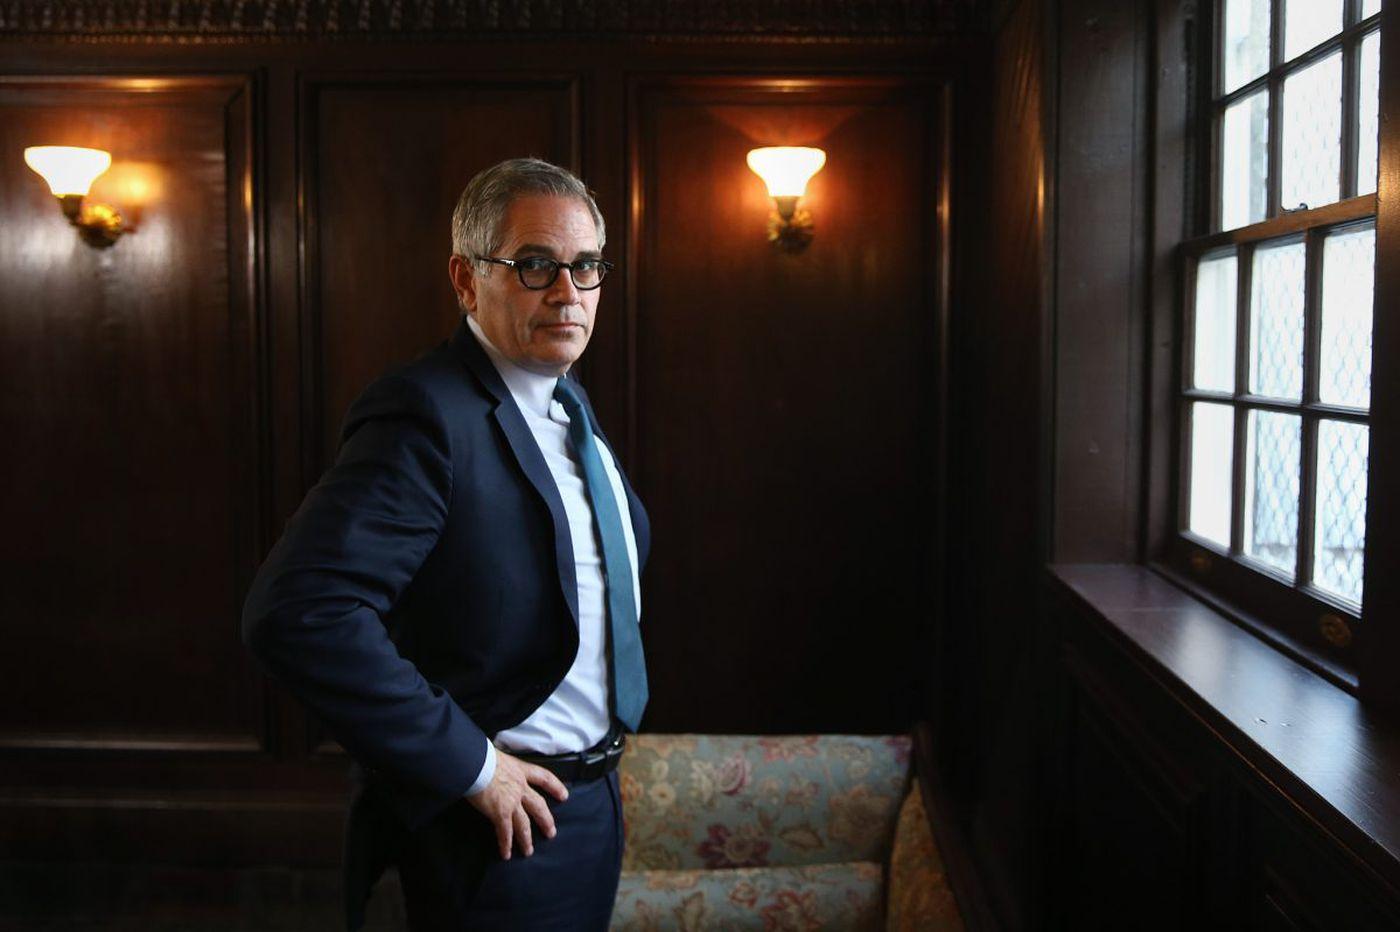 Larry Krasner needed to clean house in the D.A.'s office | Solomon Jones